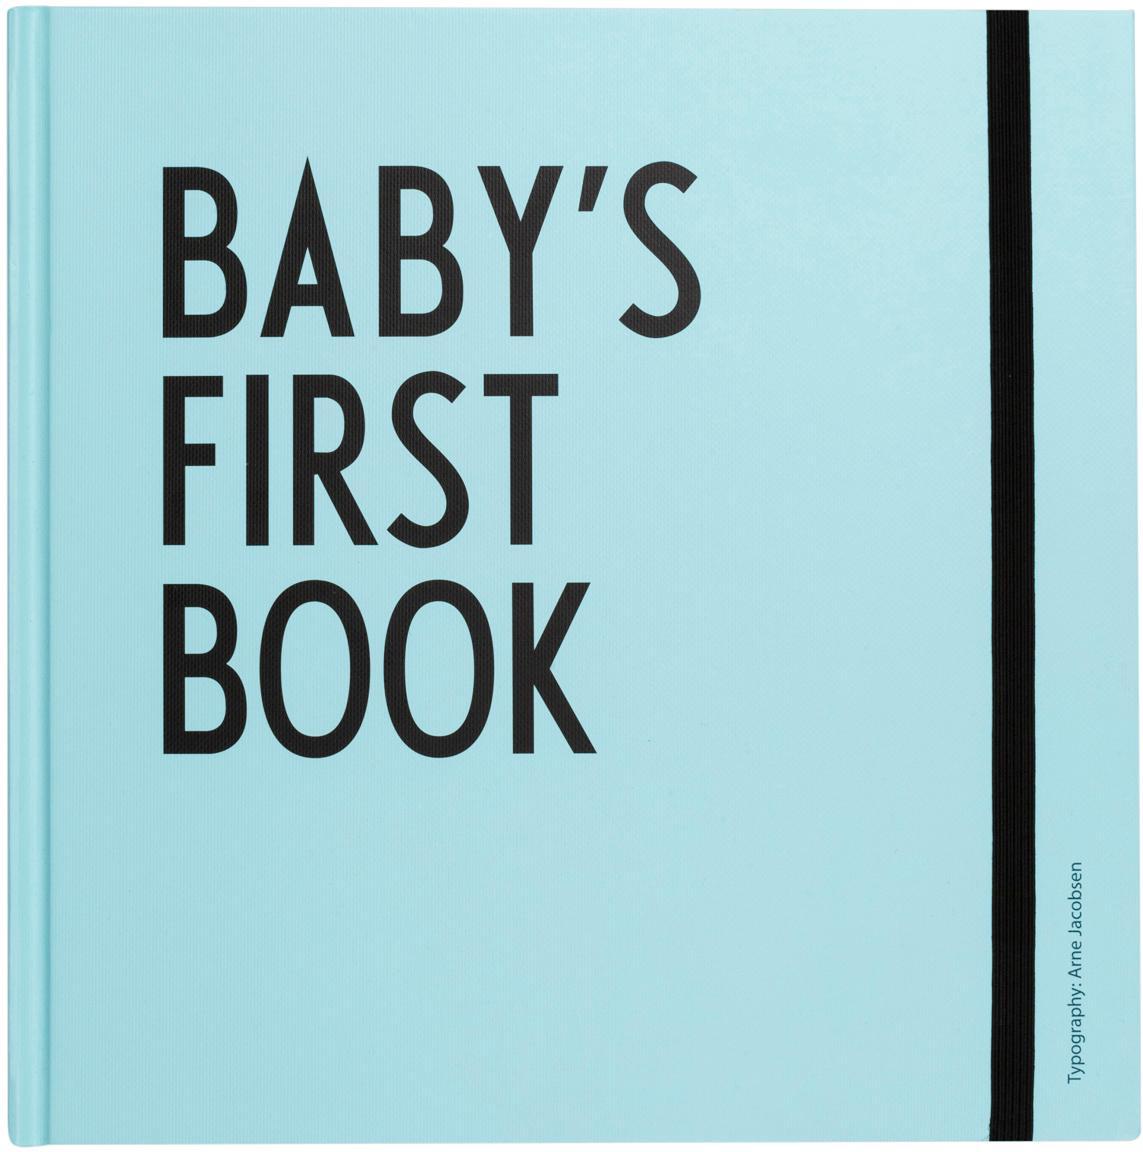 Babyboek Baby´s First Book, Papier, Blauw, 25 x 25 cm